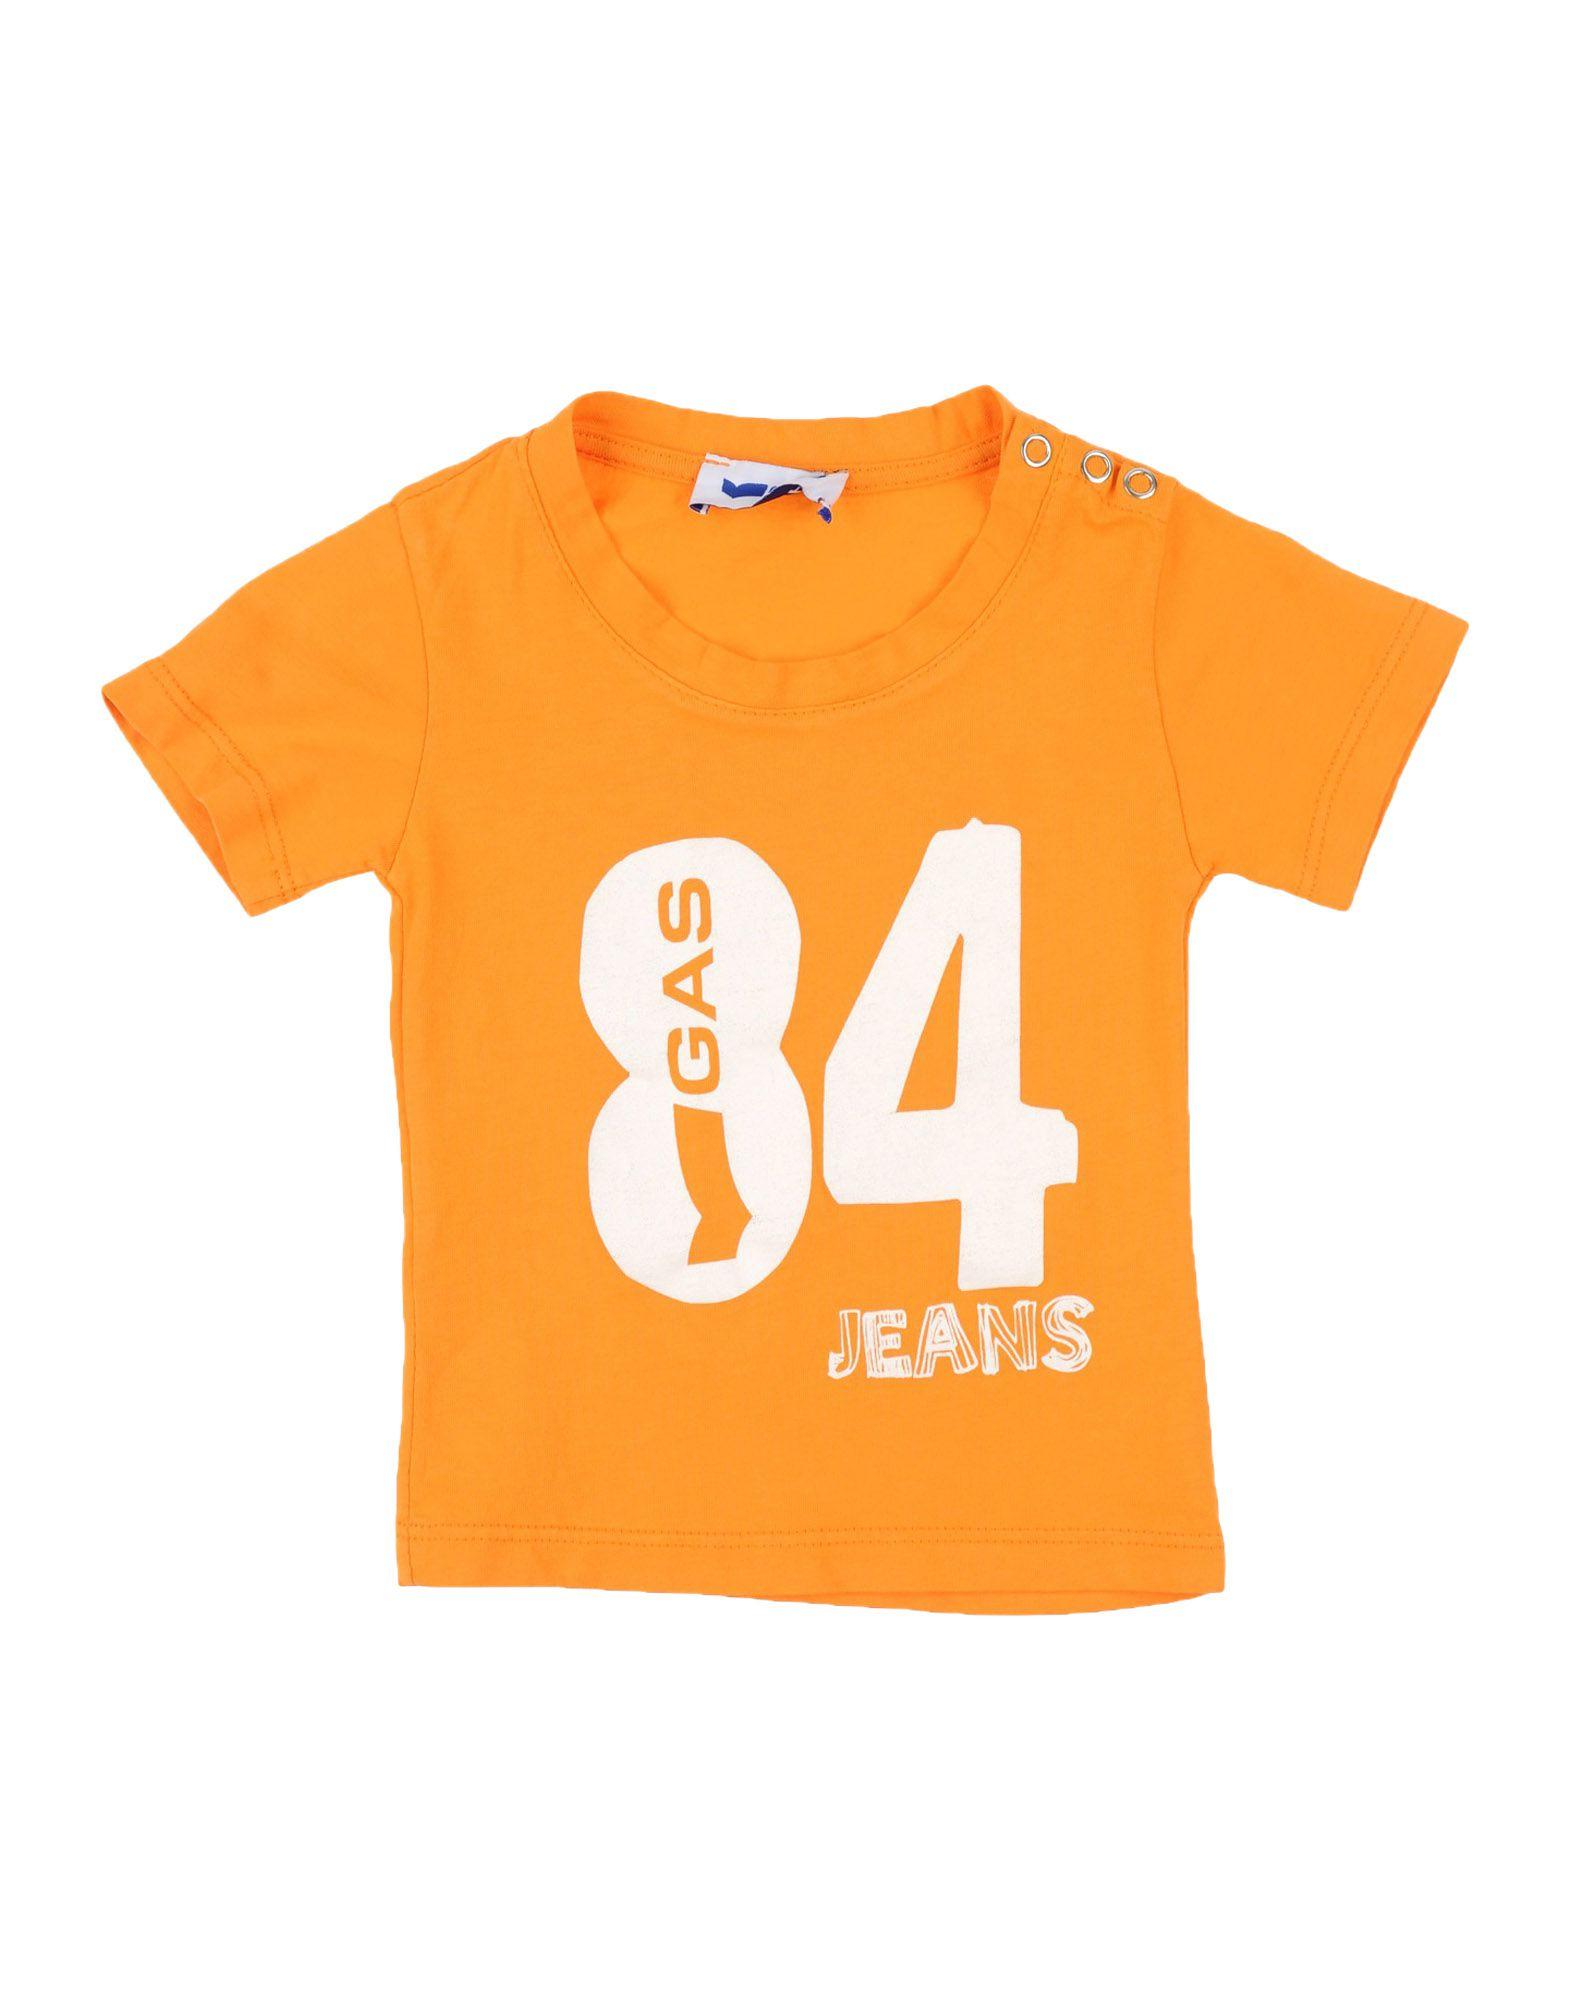 Gas Kids' T-shirts In Orange